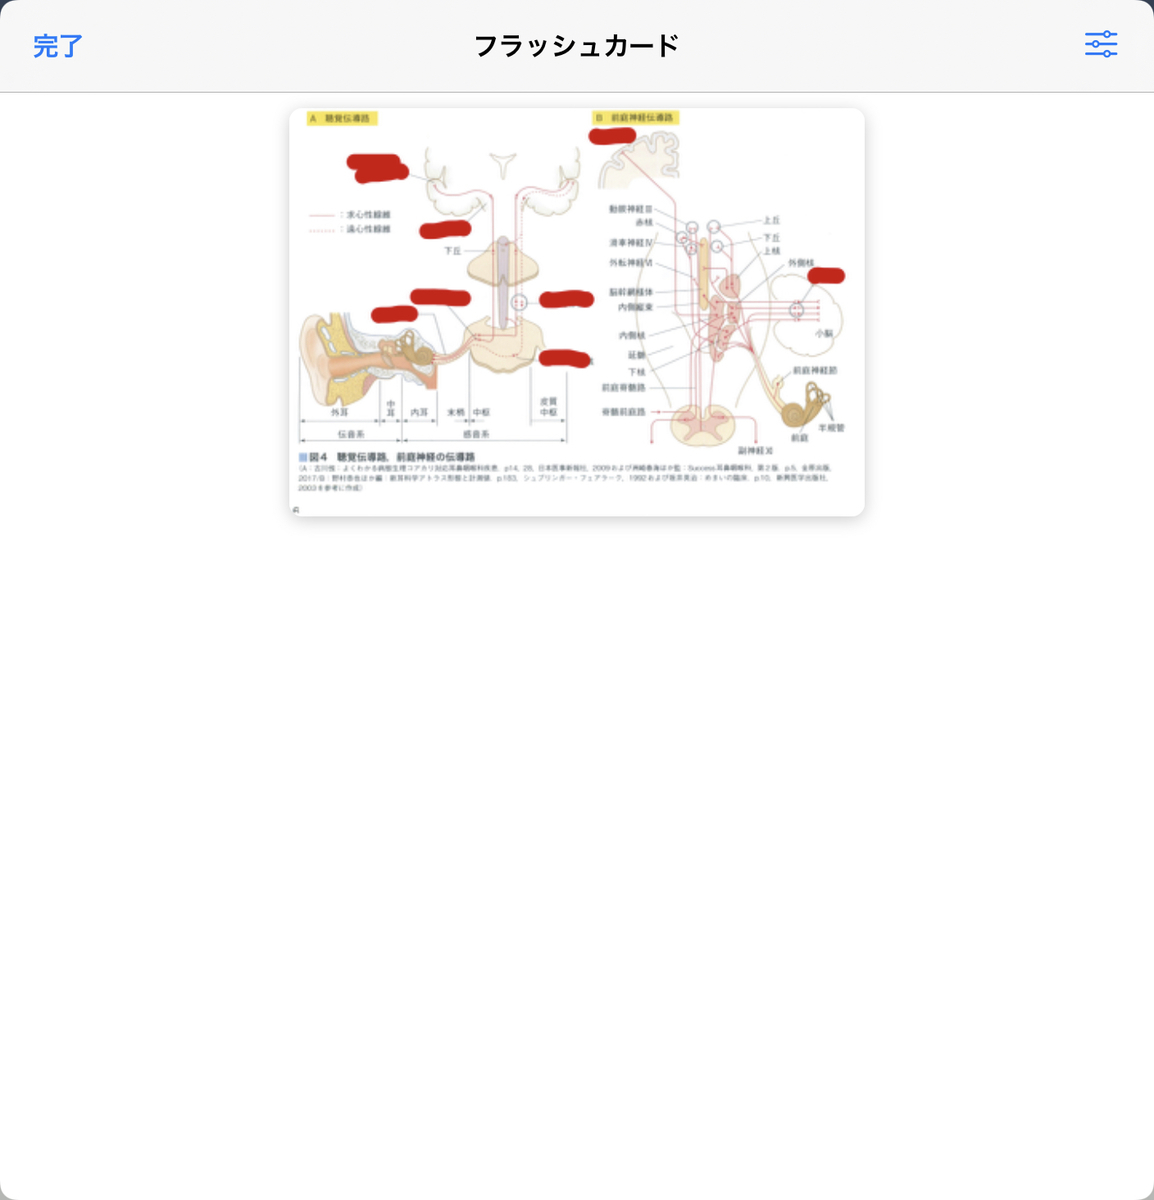 f:id:takashineozeon:20210528073901j:plain